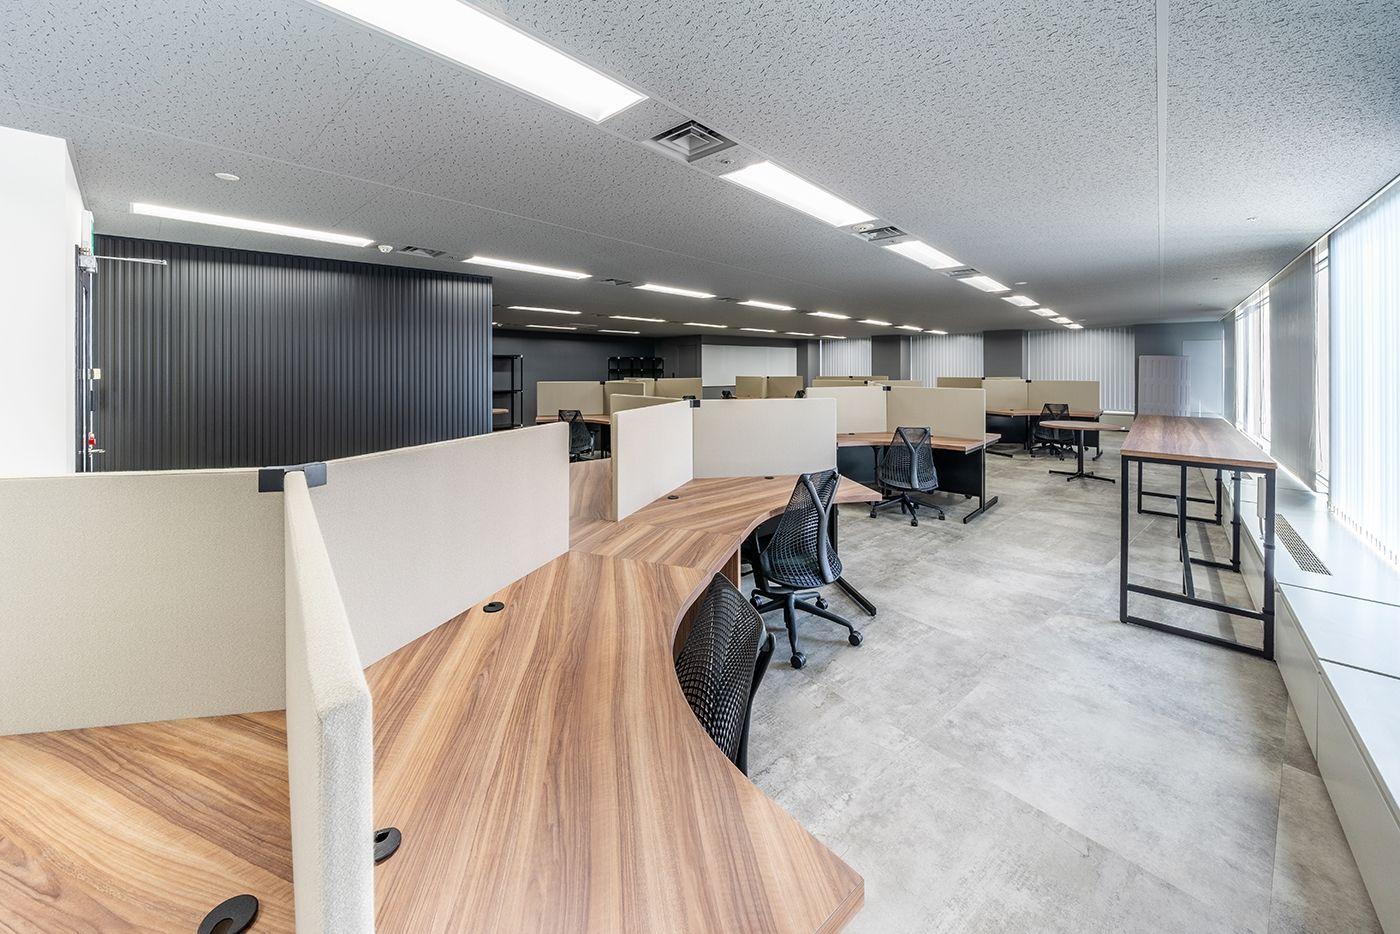 Conceptual Gixo Office Design デザイナーズオフィスのヴィス 家具デザイン デザイン オフィスデザイン